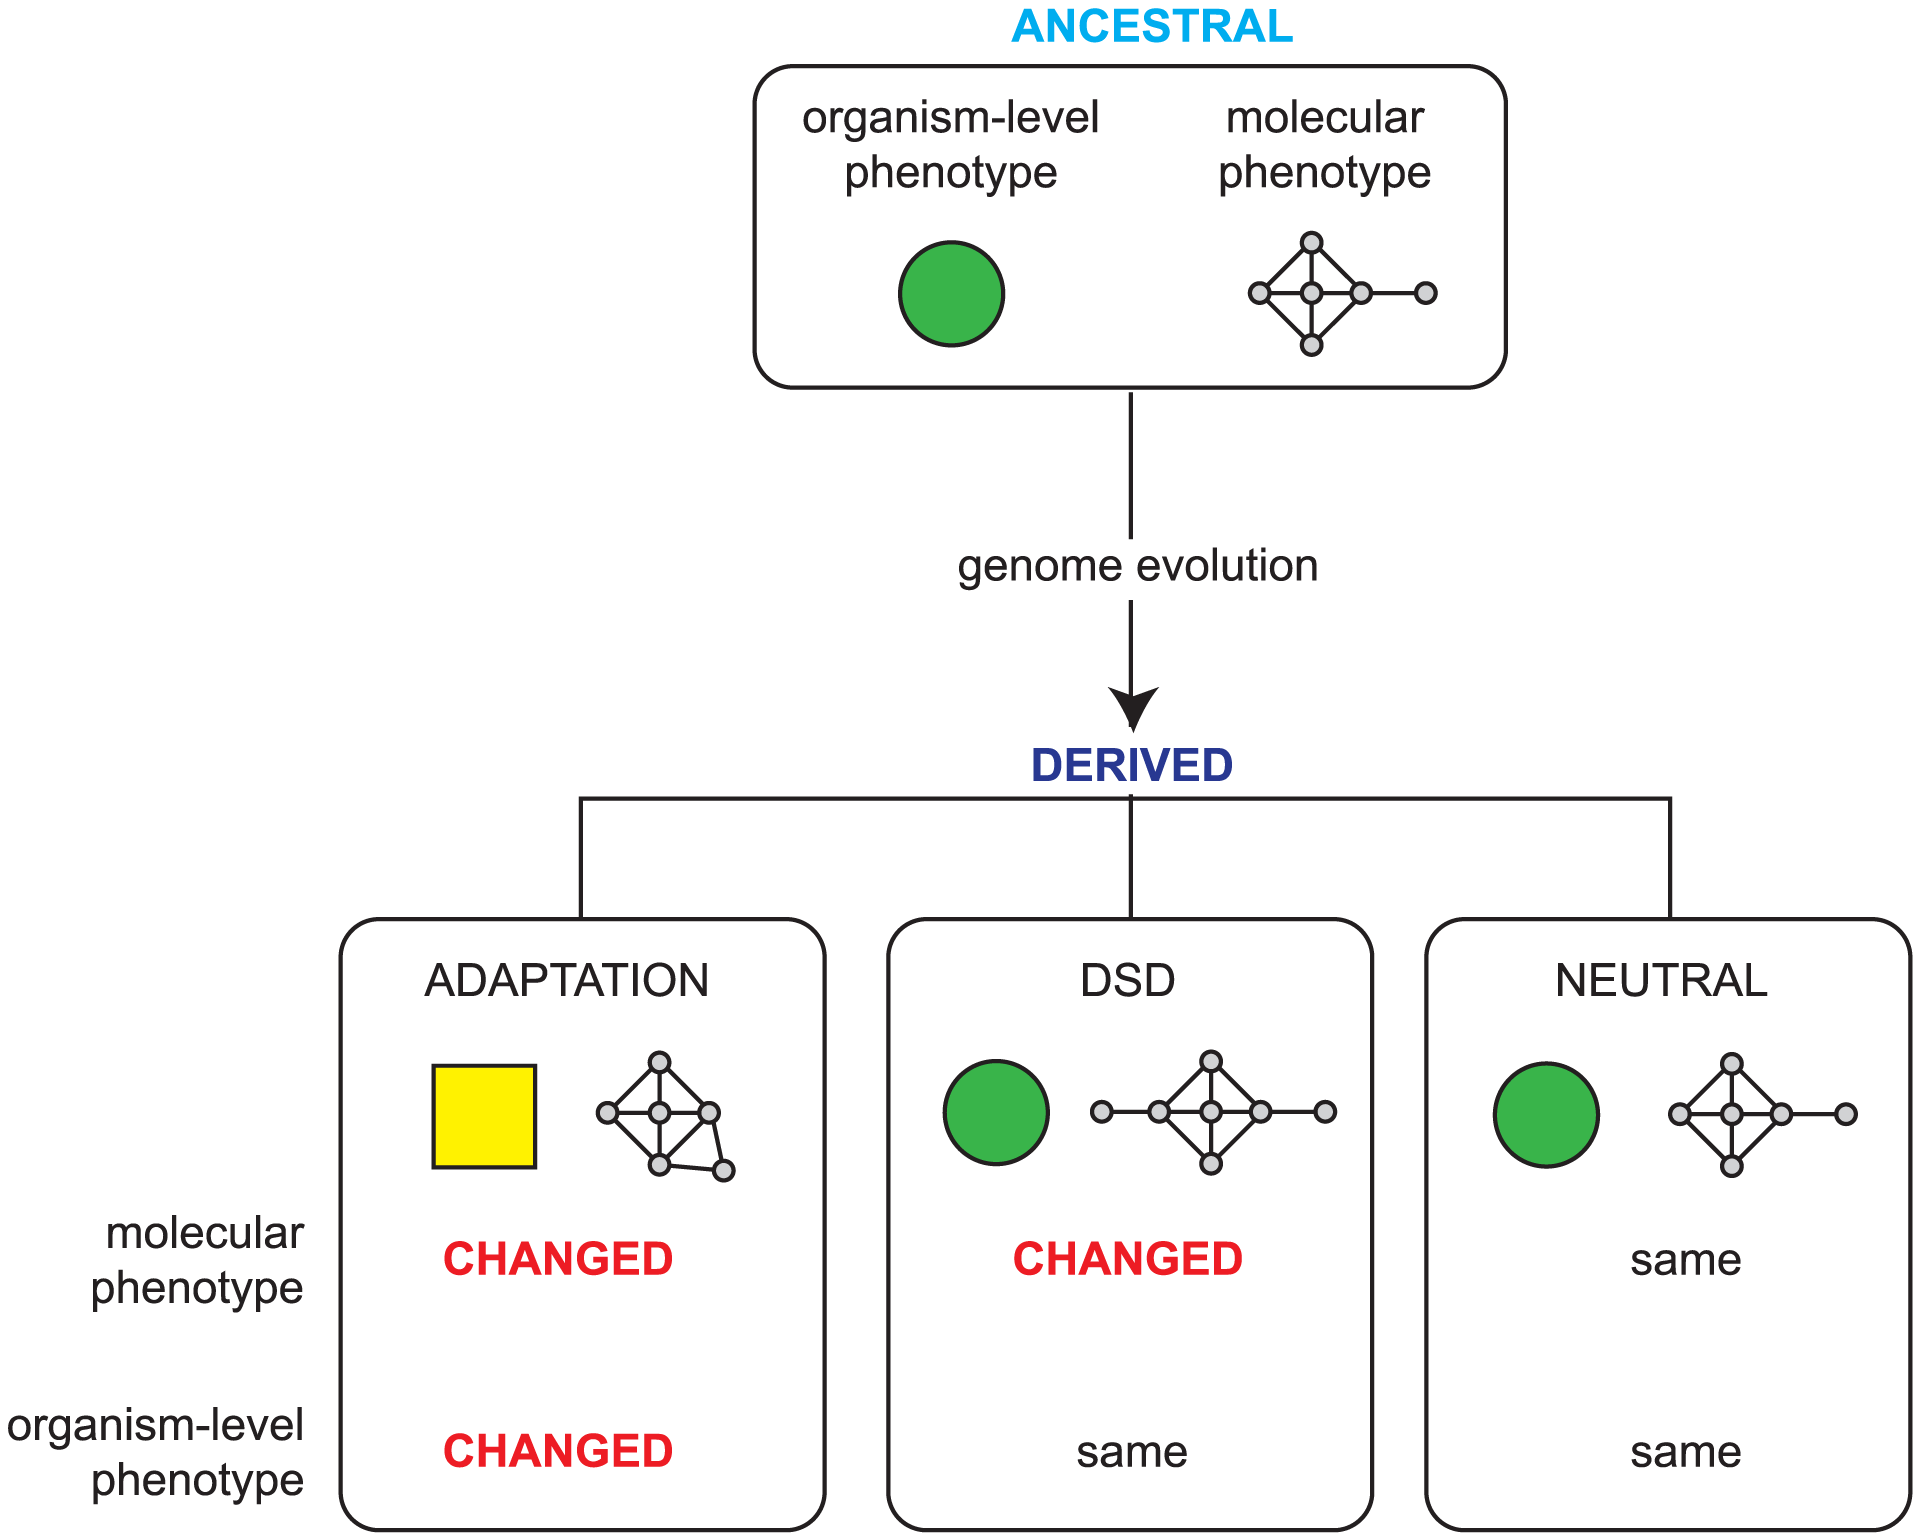 Possible outcomes of genome evolution.